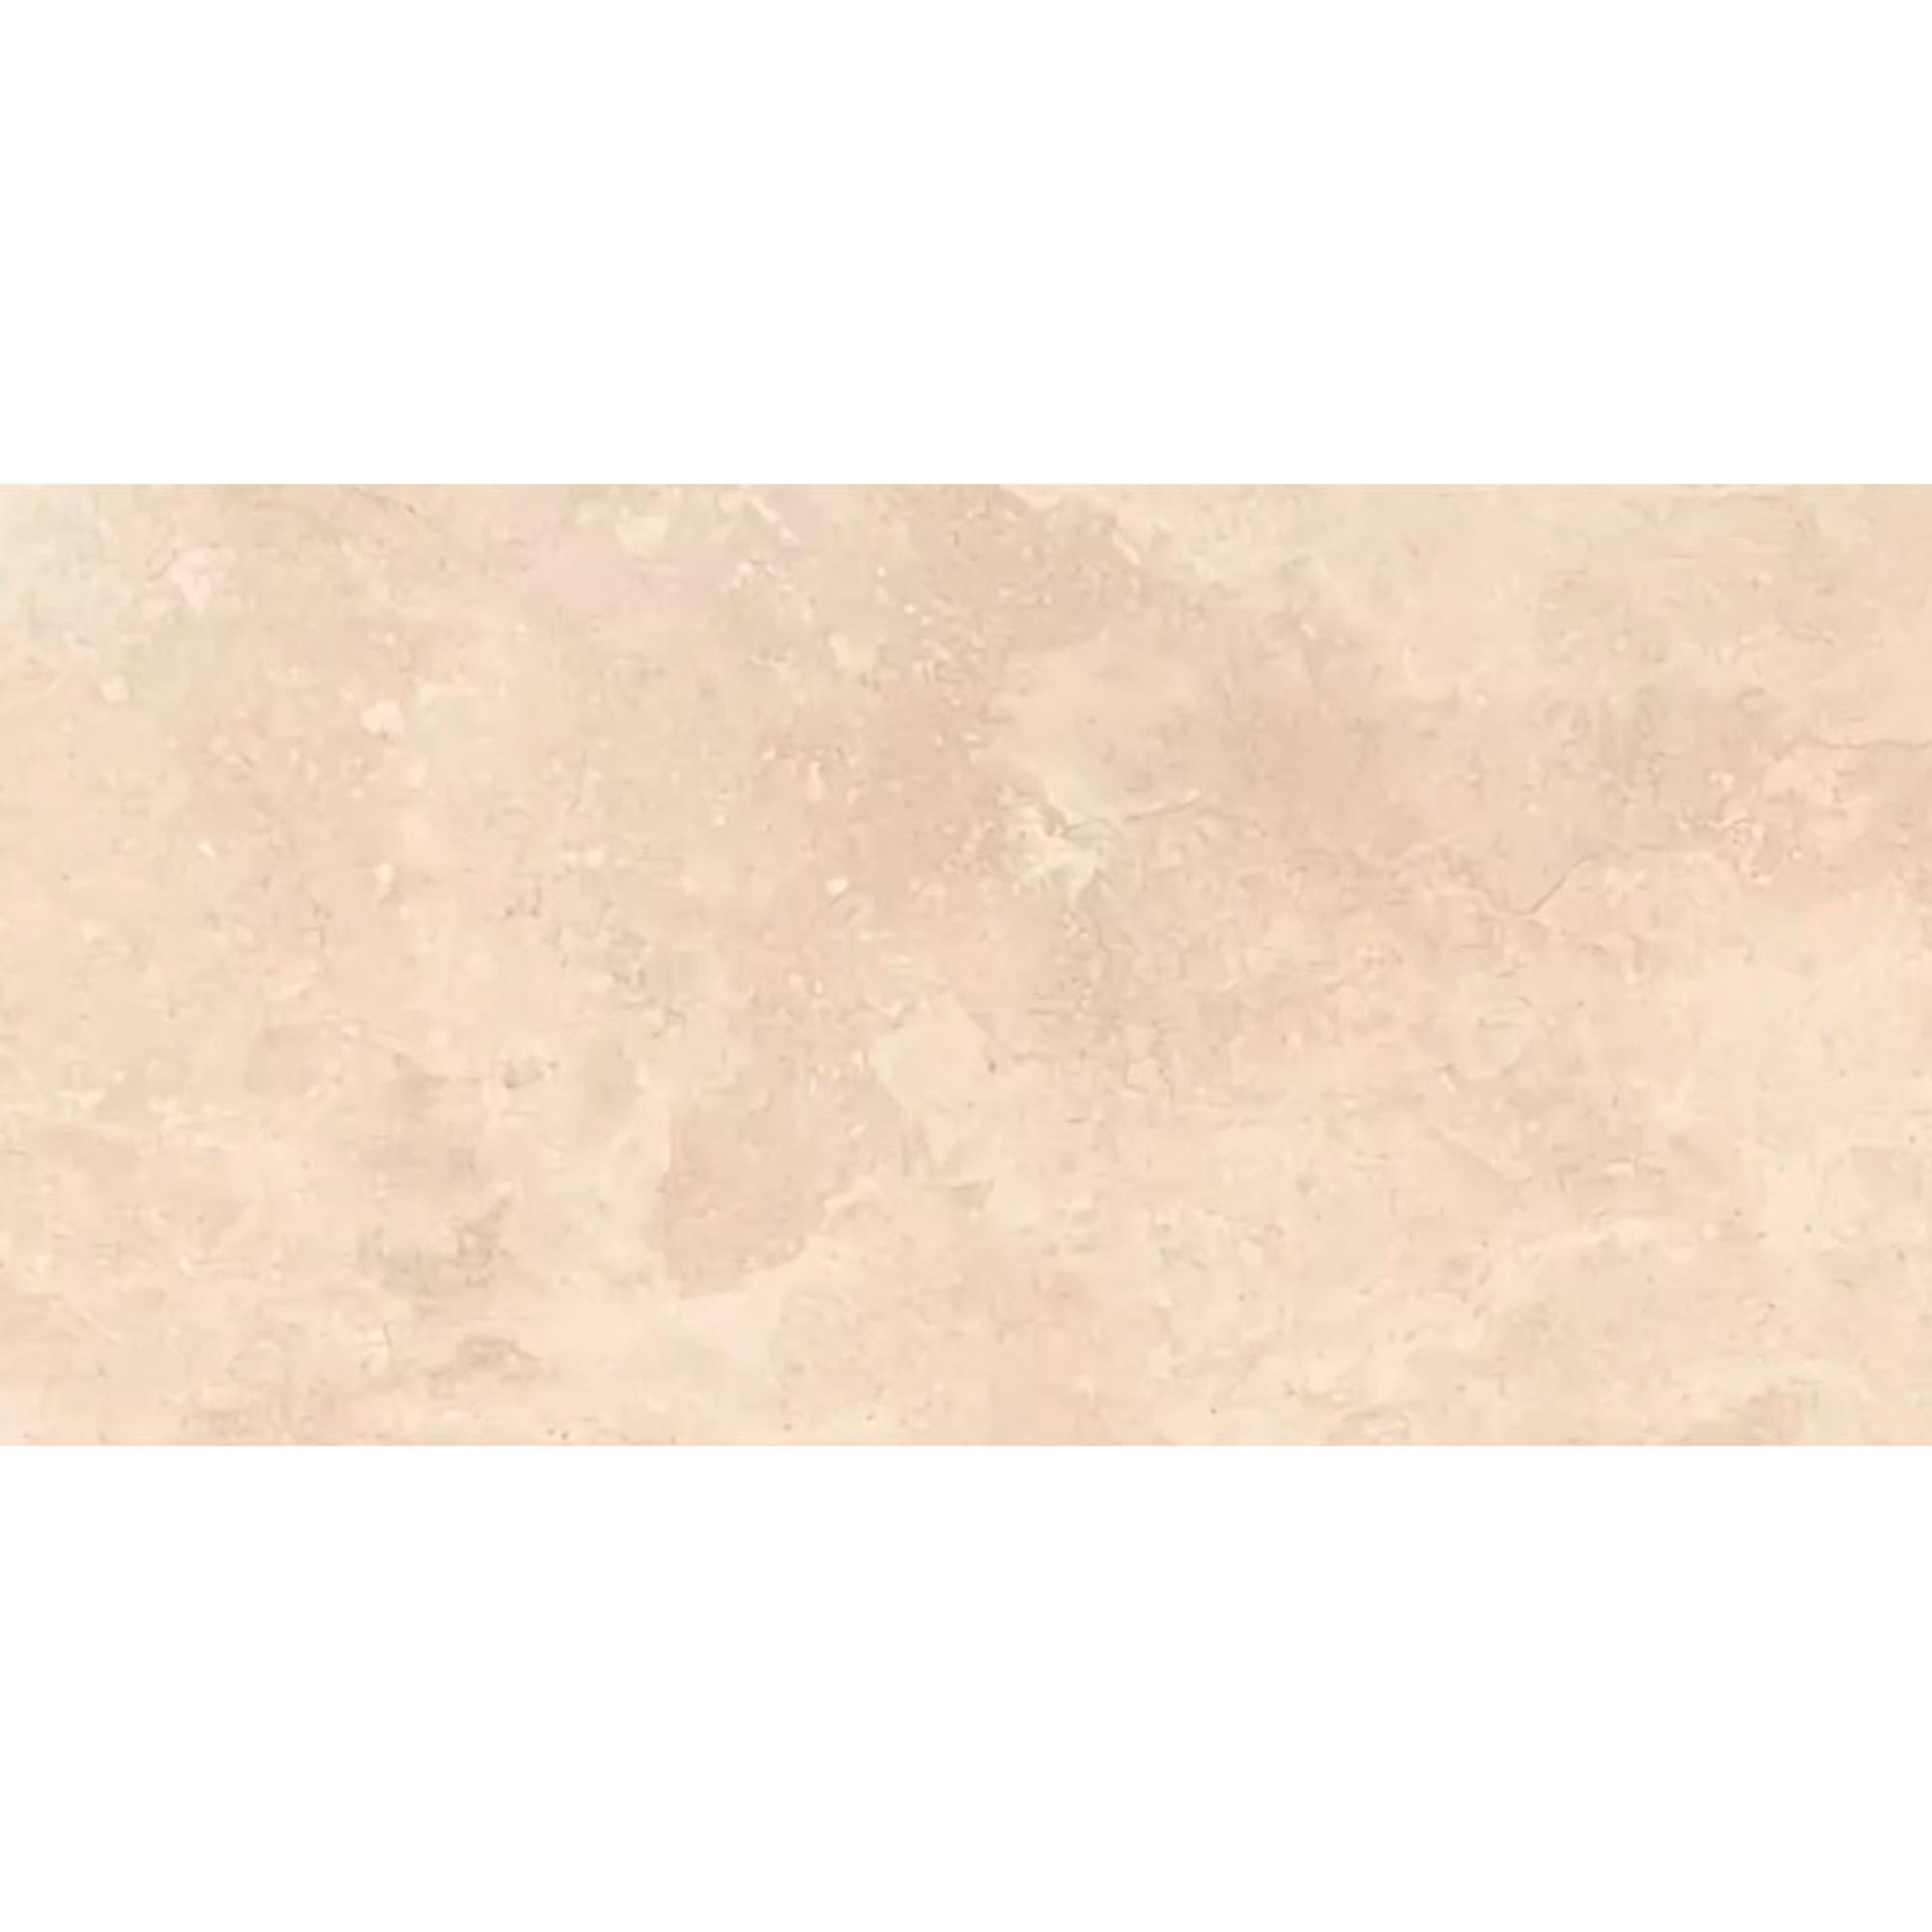 Плитка Kerlife Pietra 1C Beige 63x31,5 см плитка kerlife eterna beige 20 1x50 5 см